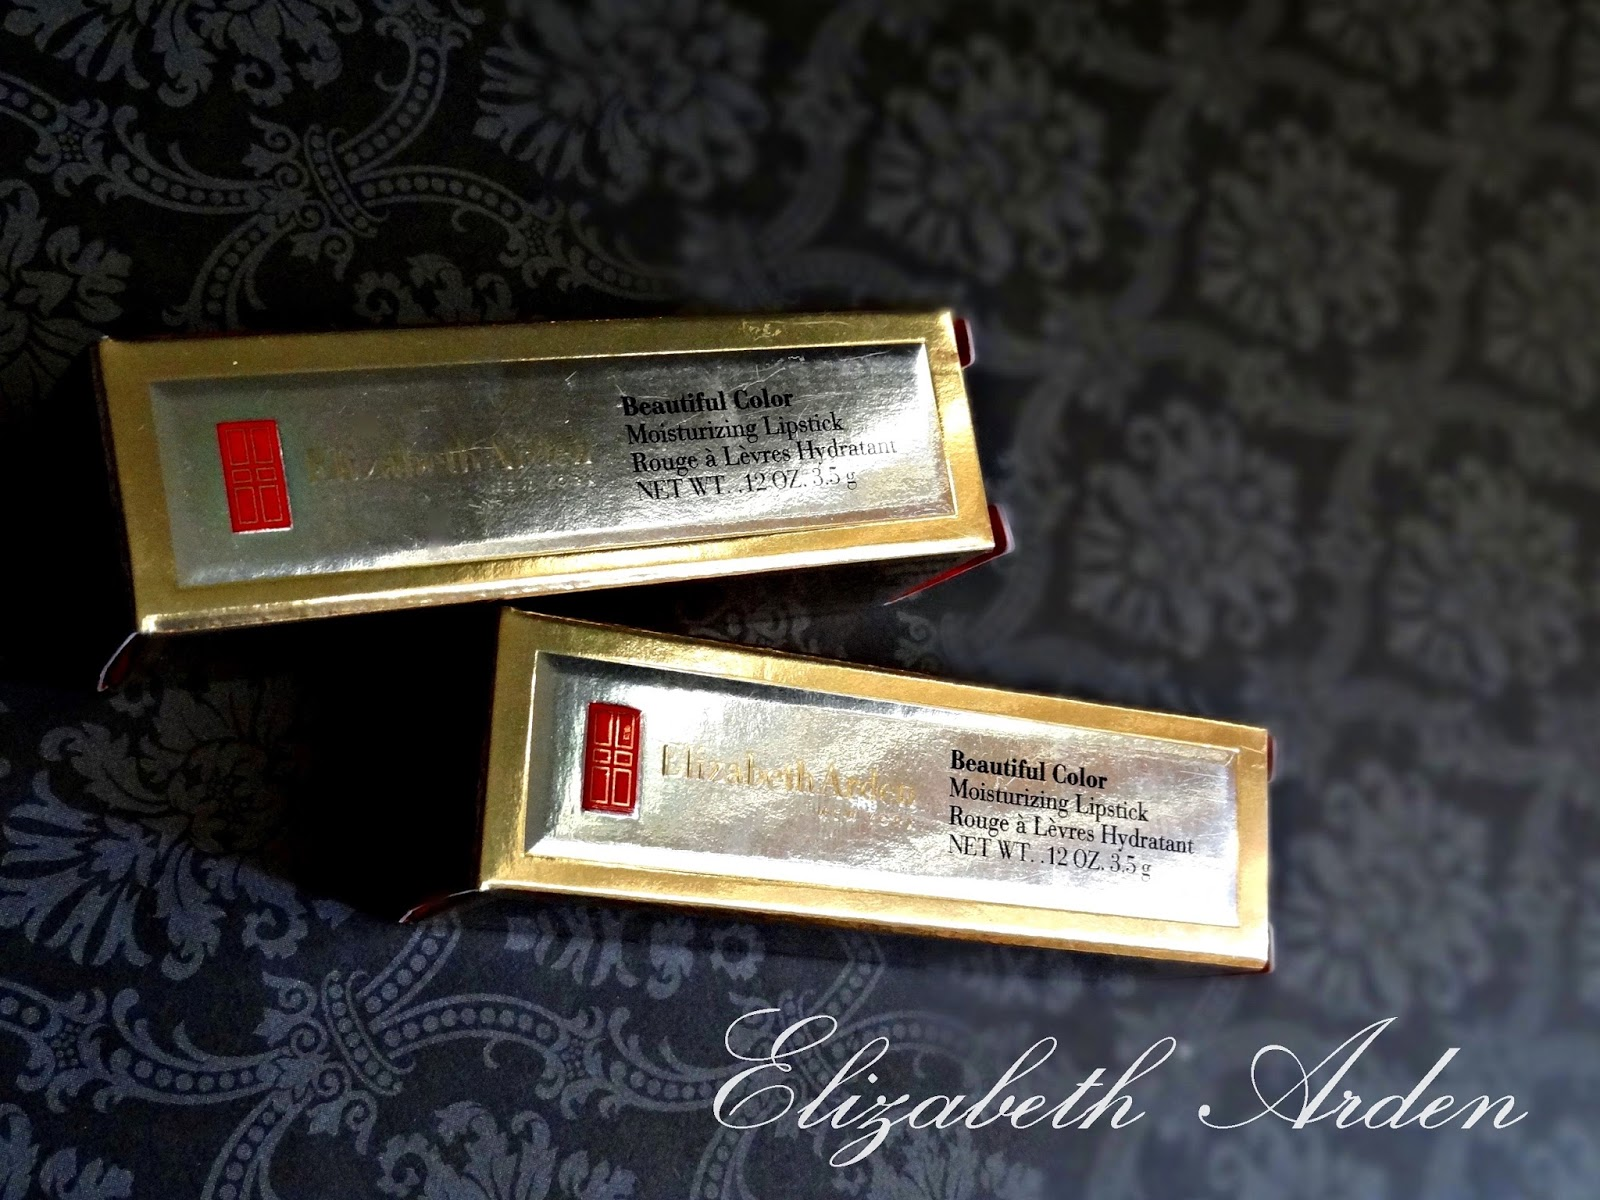 ELizabeth Arden Beautiful Color Moisturizing Lipstick Review, Photos & Swatches